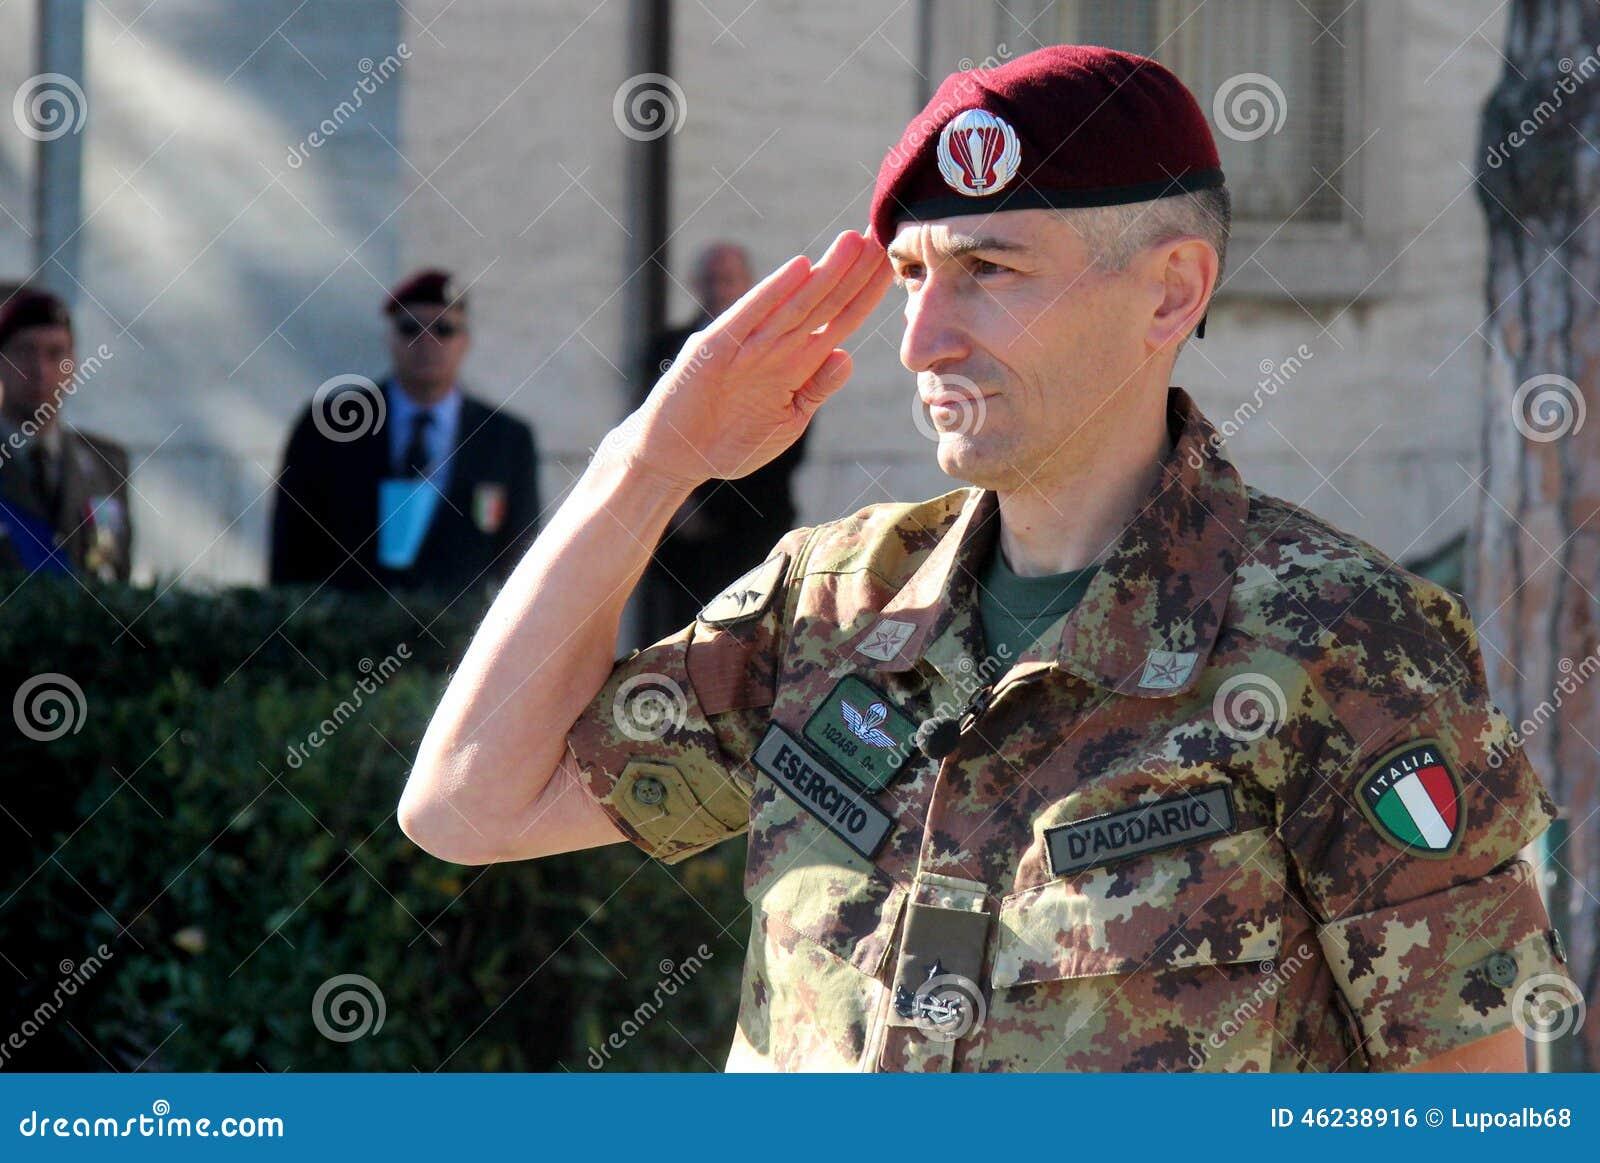 Folgore降伞旅团的劳伦斯D addario司令员将军